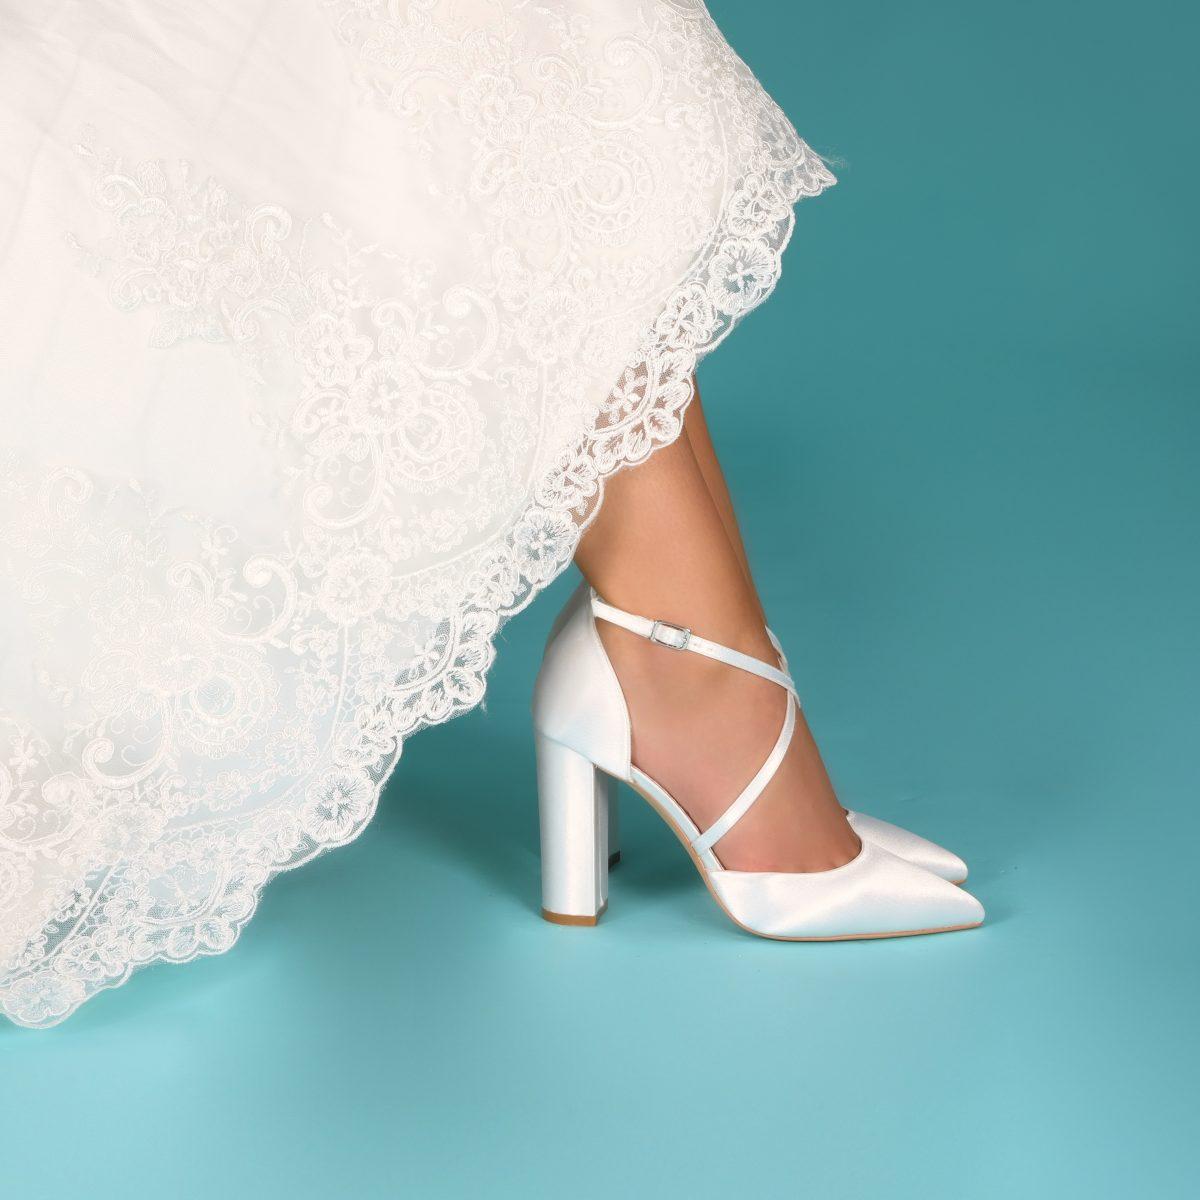 Perfect Bridal Keira Shoes - Ivory Satin 2